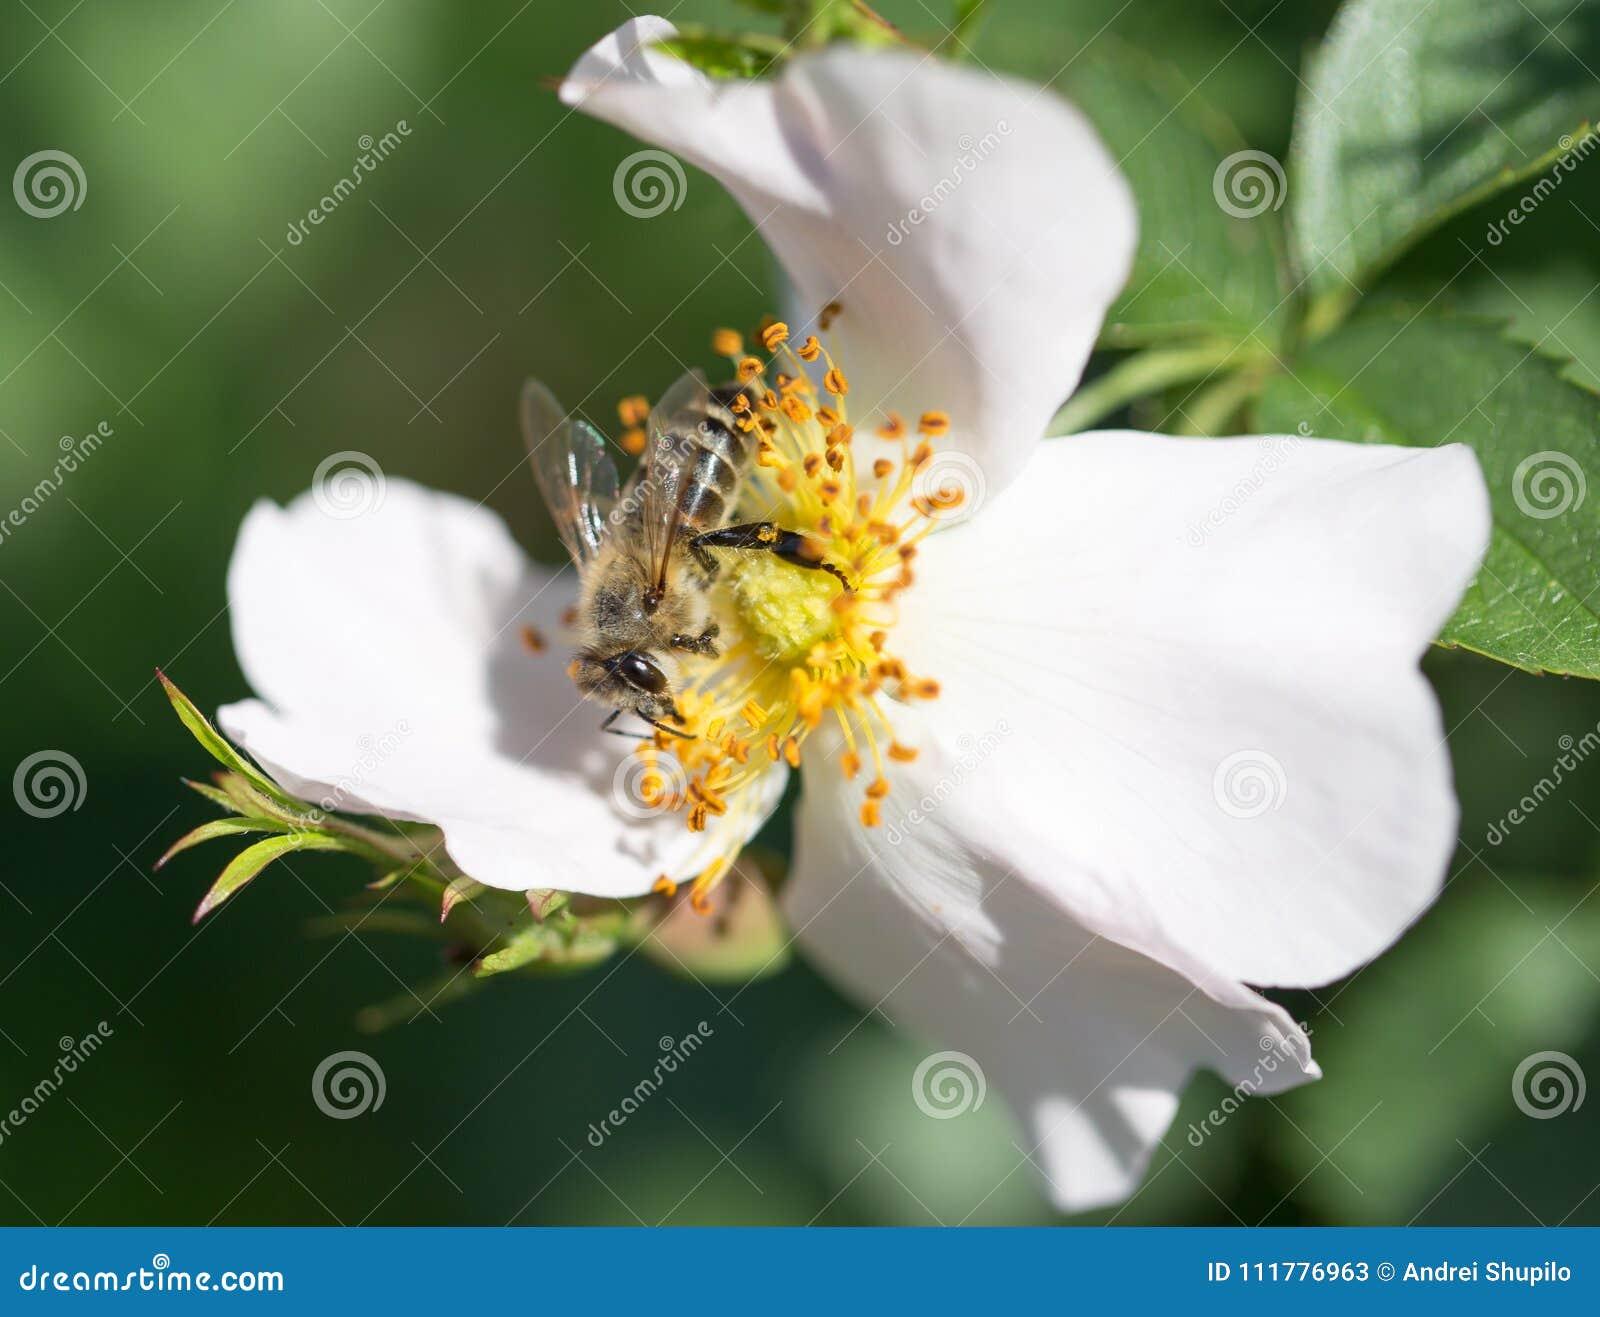 Bee on a flower. macro